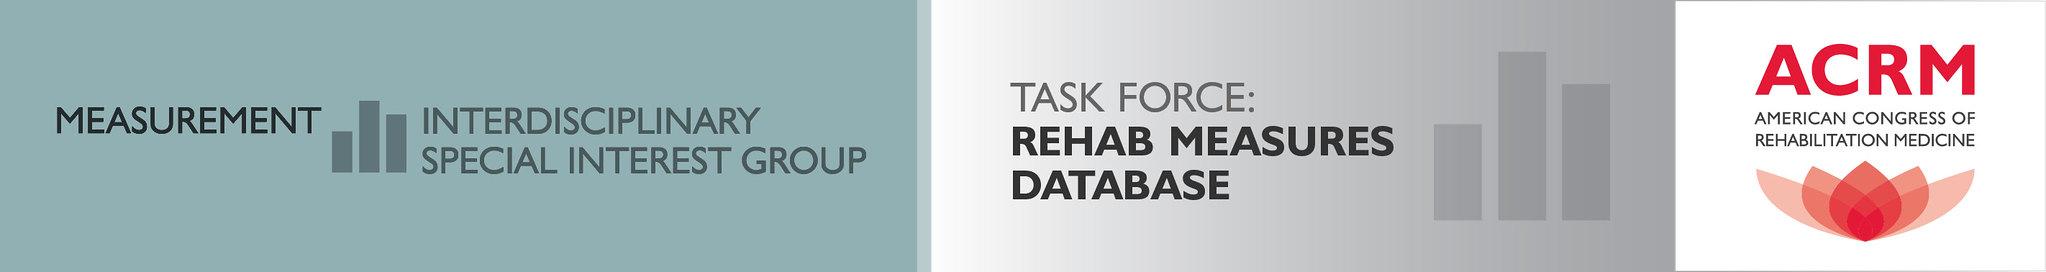 ACRM Measurement ISIG Rehab Measures Database Task Force banner